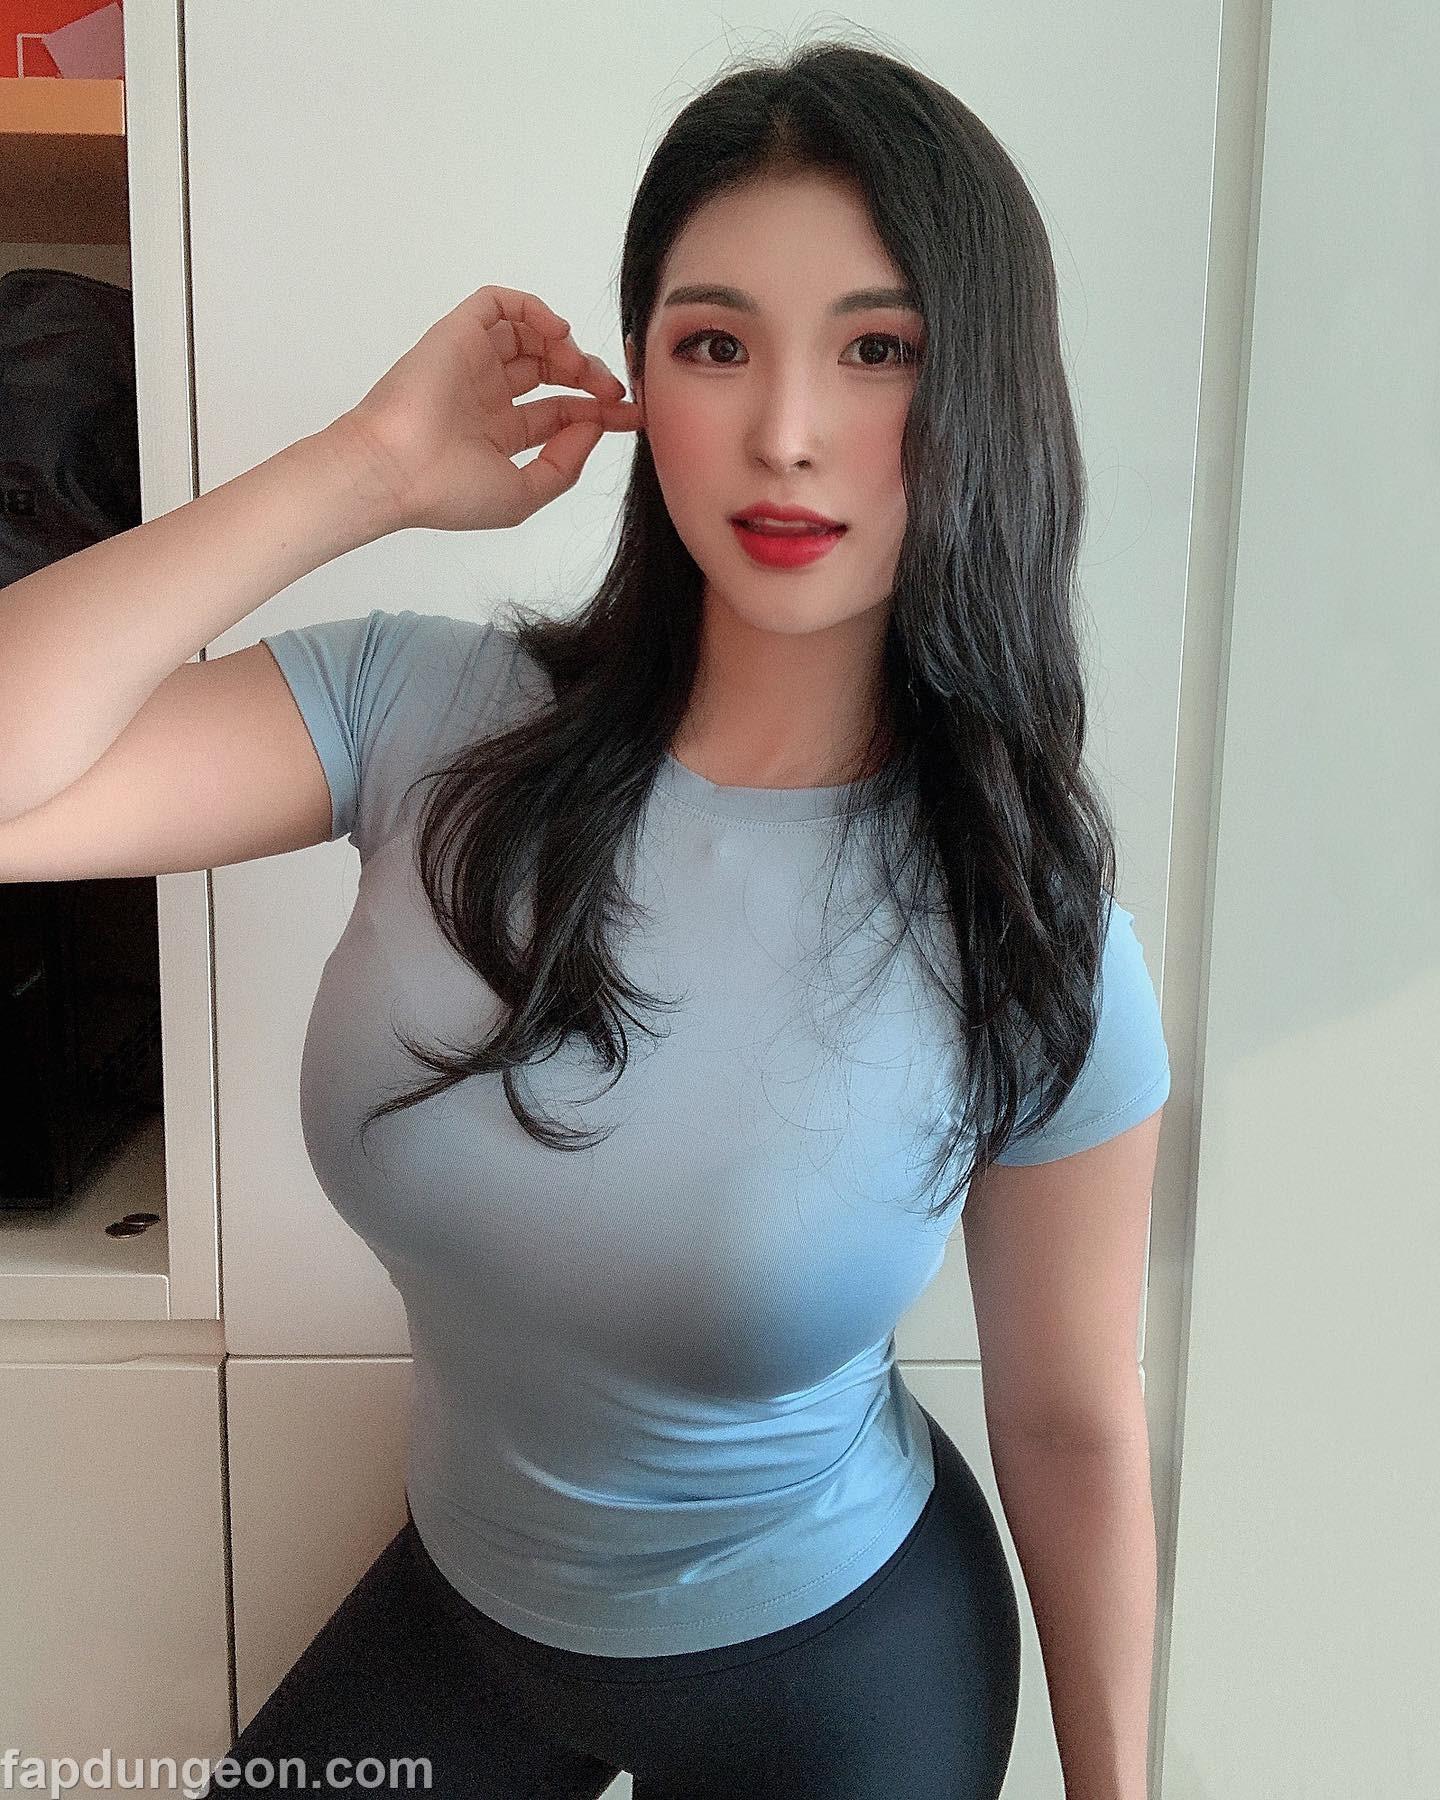 Hentai porn big woman